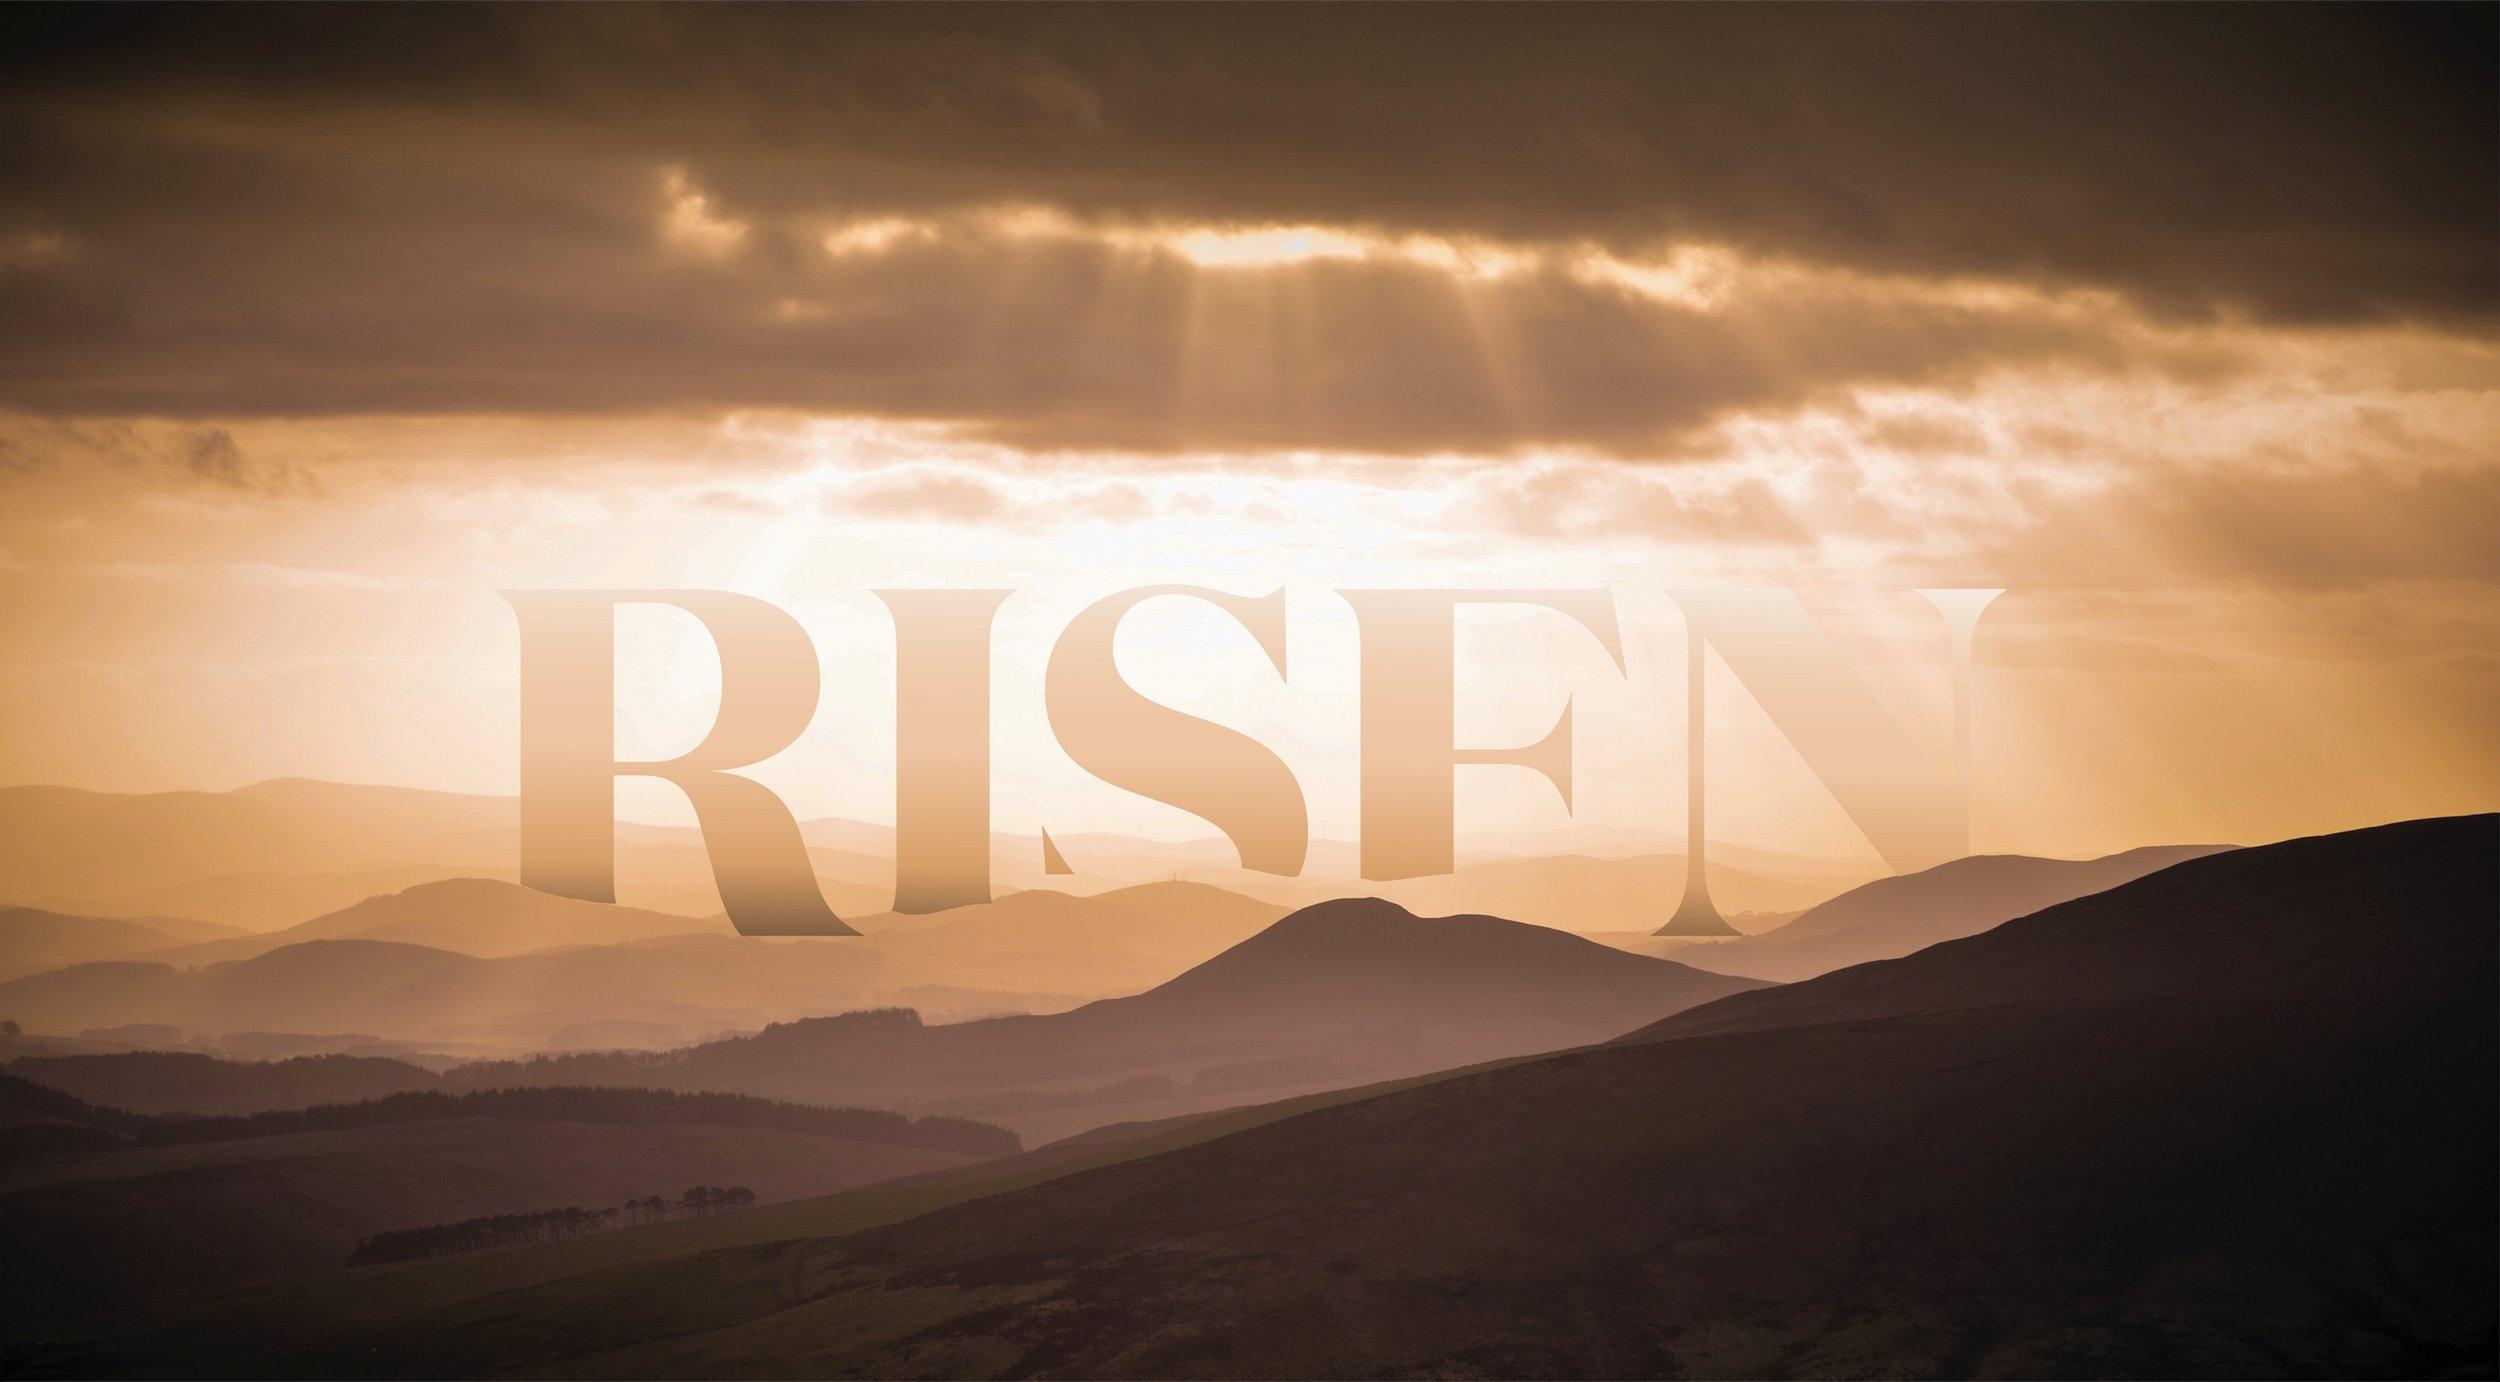 Easter Graphic (1).jpg